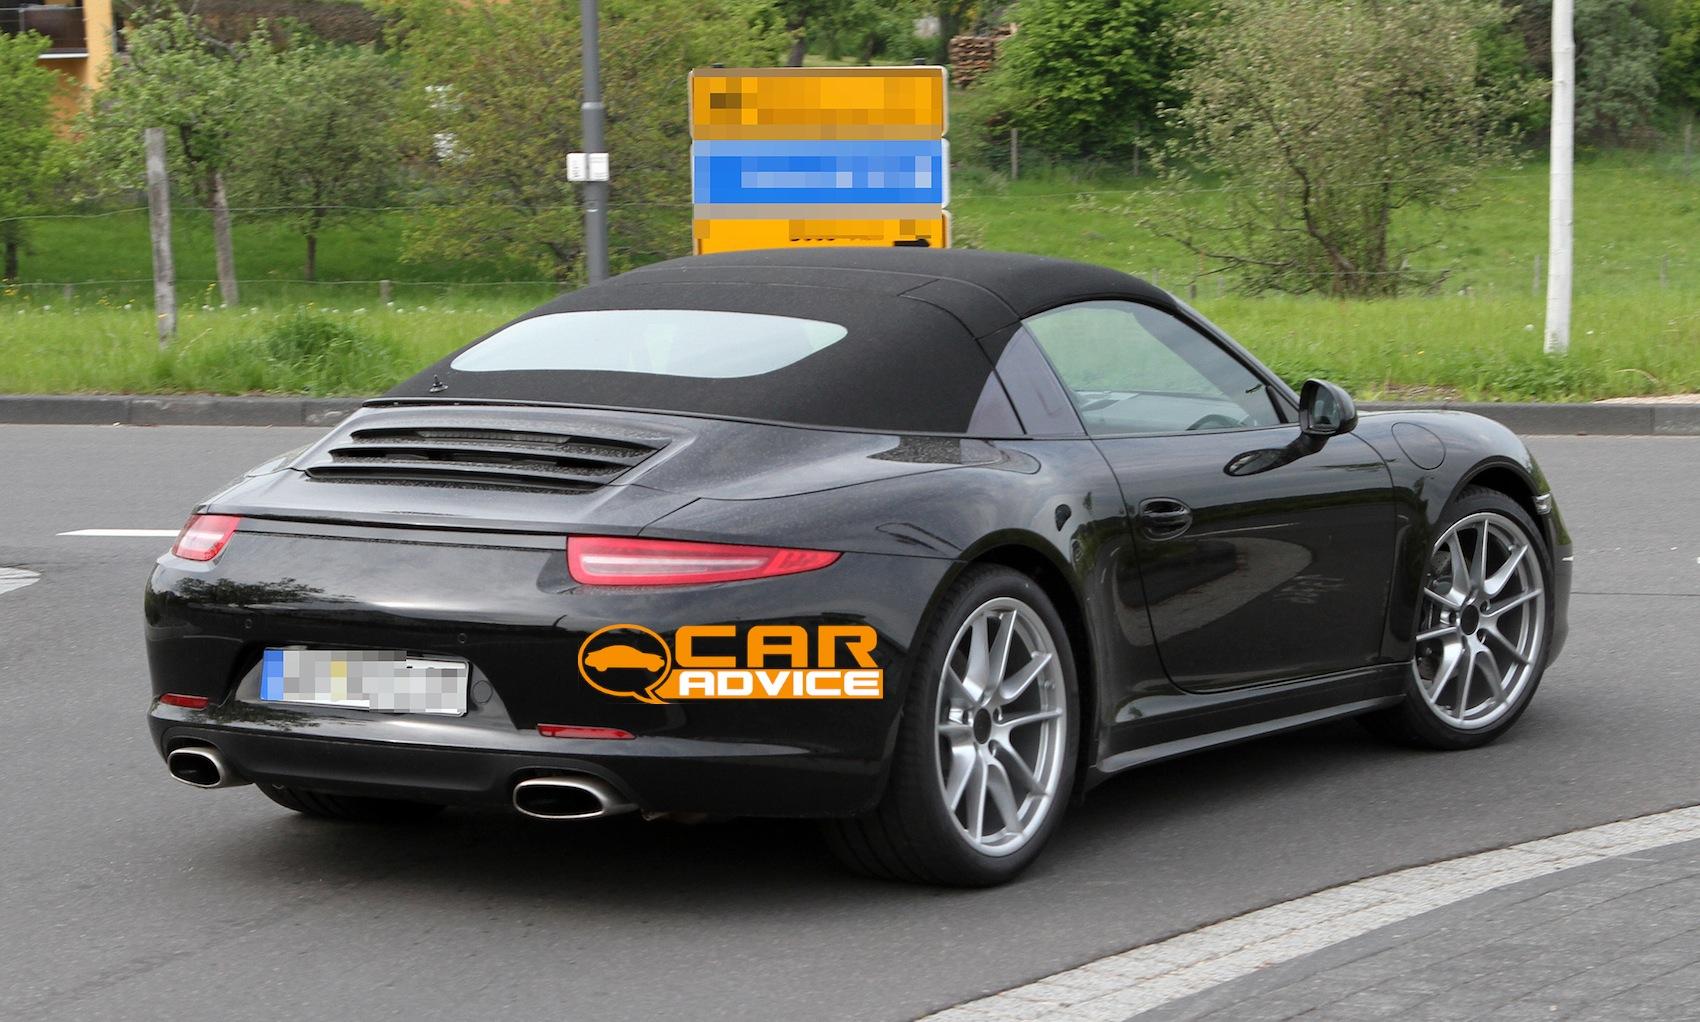 Porsche 911 Targa Iconic Roof Design Returns Photos 1